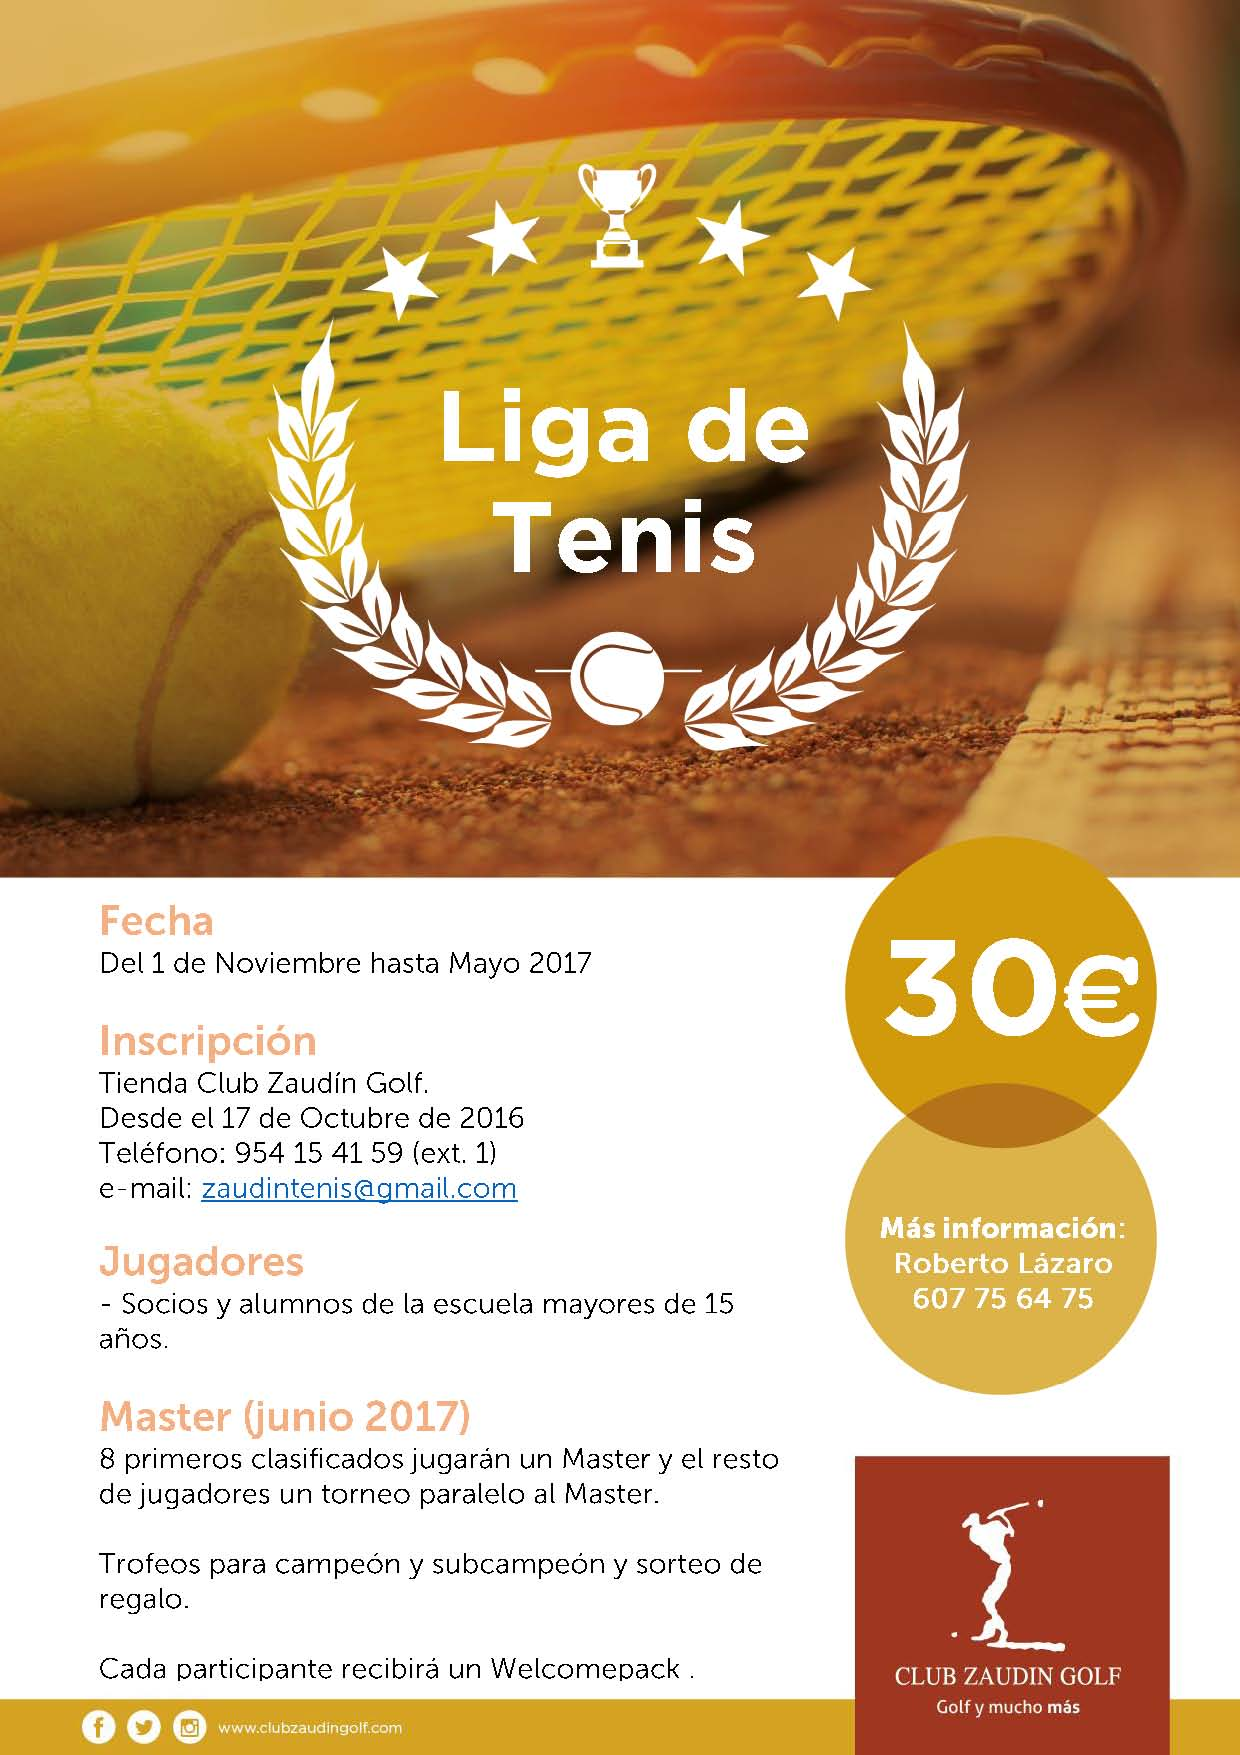 Liga de Adultos de Tenis 2016